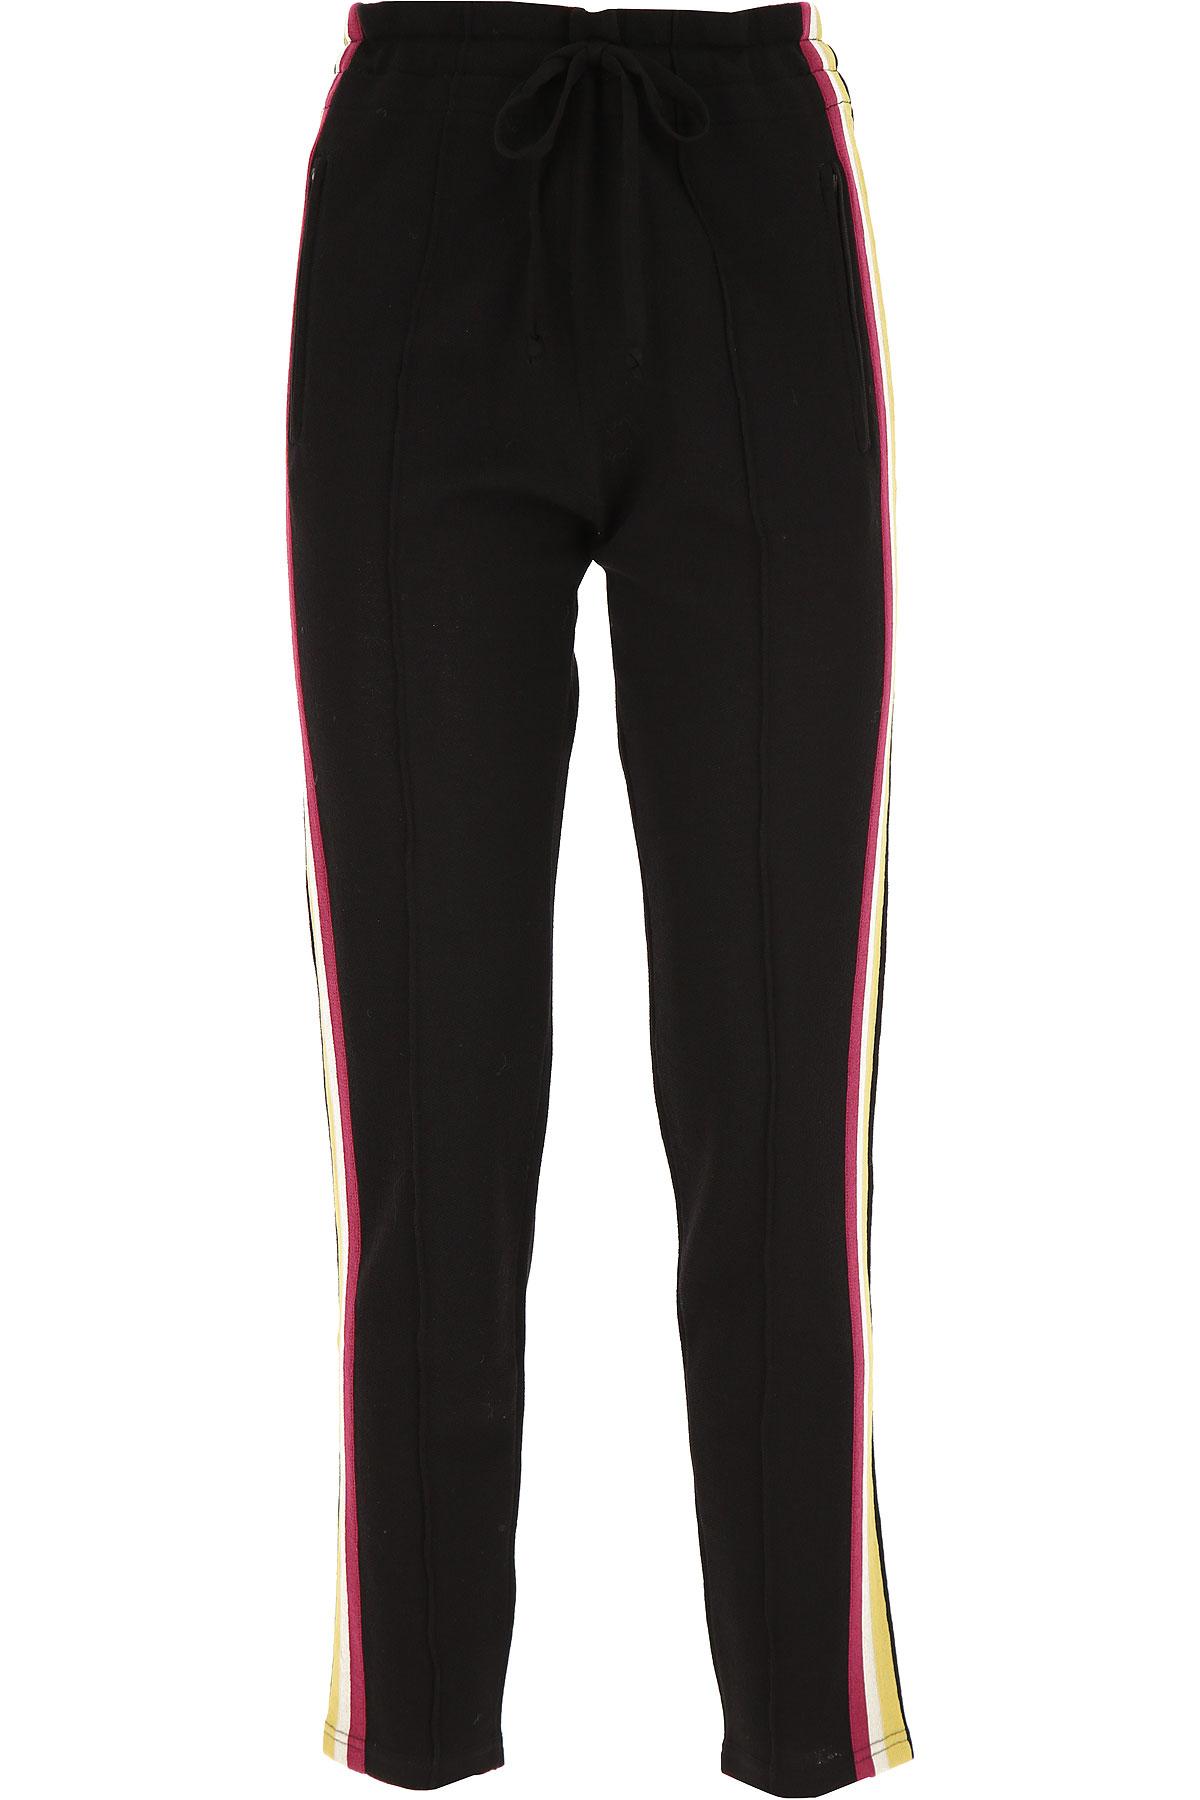 Isabel Marant Pants for Women On Sale, Black, Viscose, 2019, FR 36 • IT 40 FR 38 • IT 42 FR 40 • IT 44